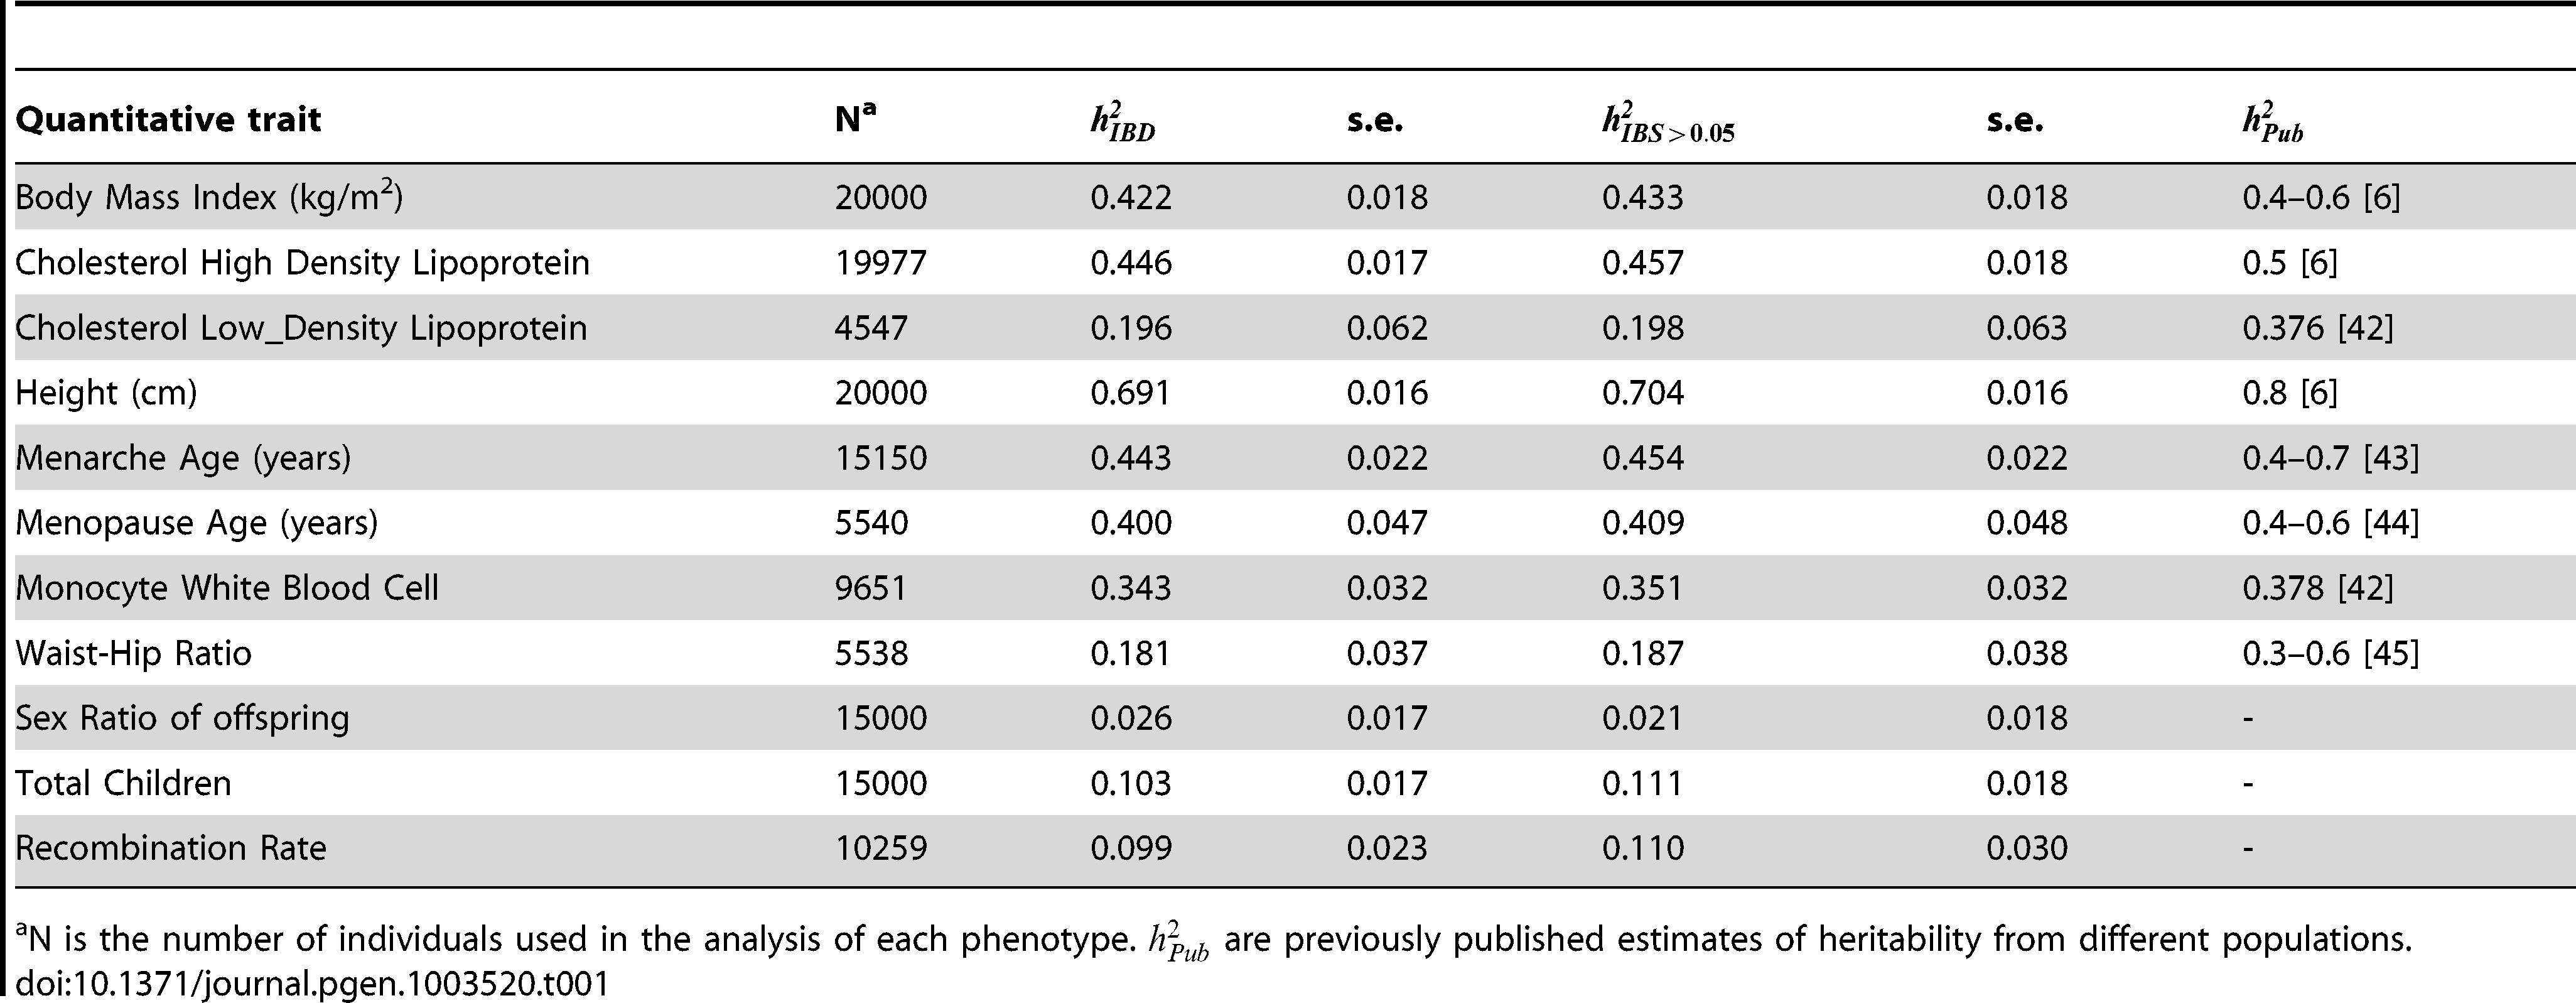 Narrow-sense heritability estimated from IBD () and thresholding IBS () for 11 quantitative traits.